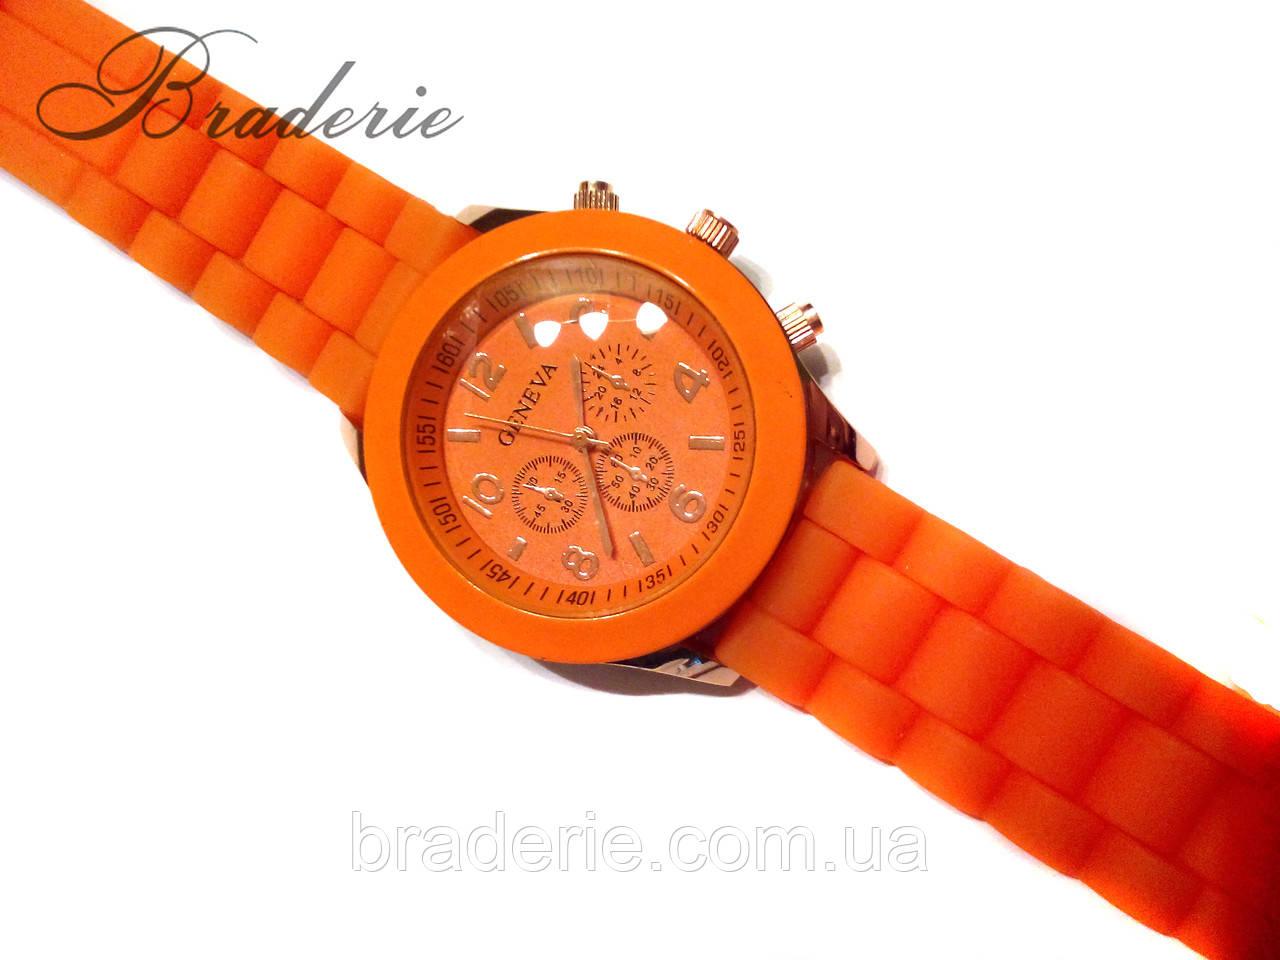 Наручные часы Geneva оранжевые